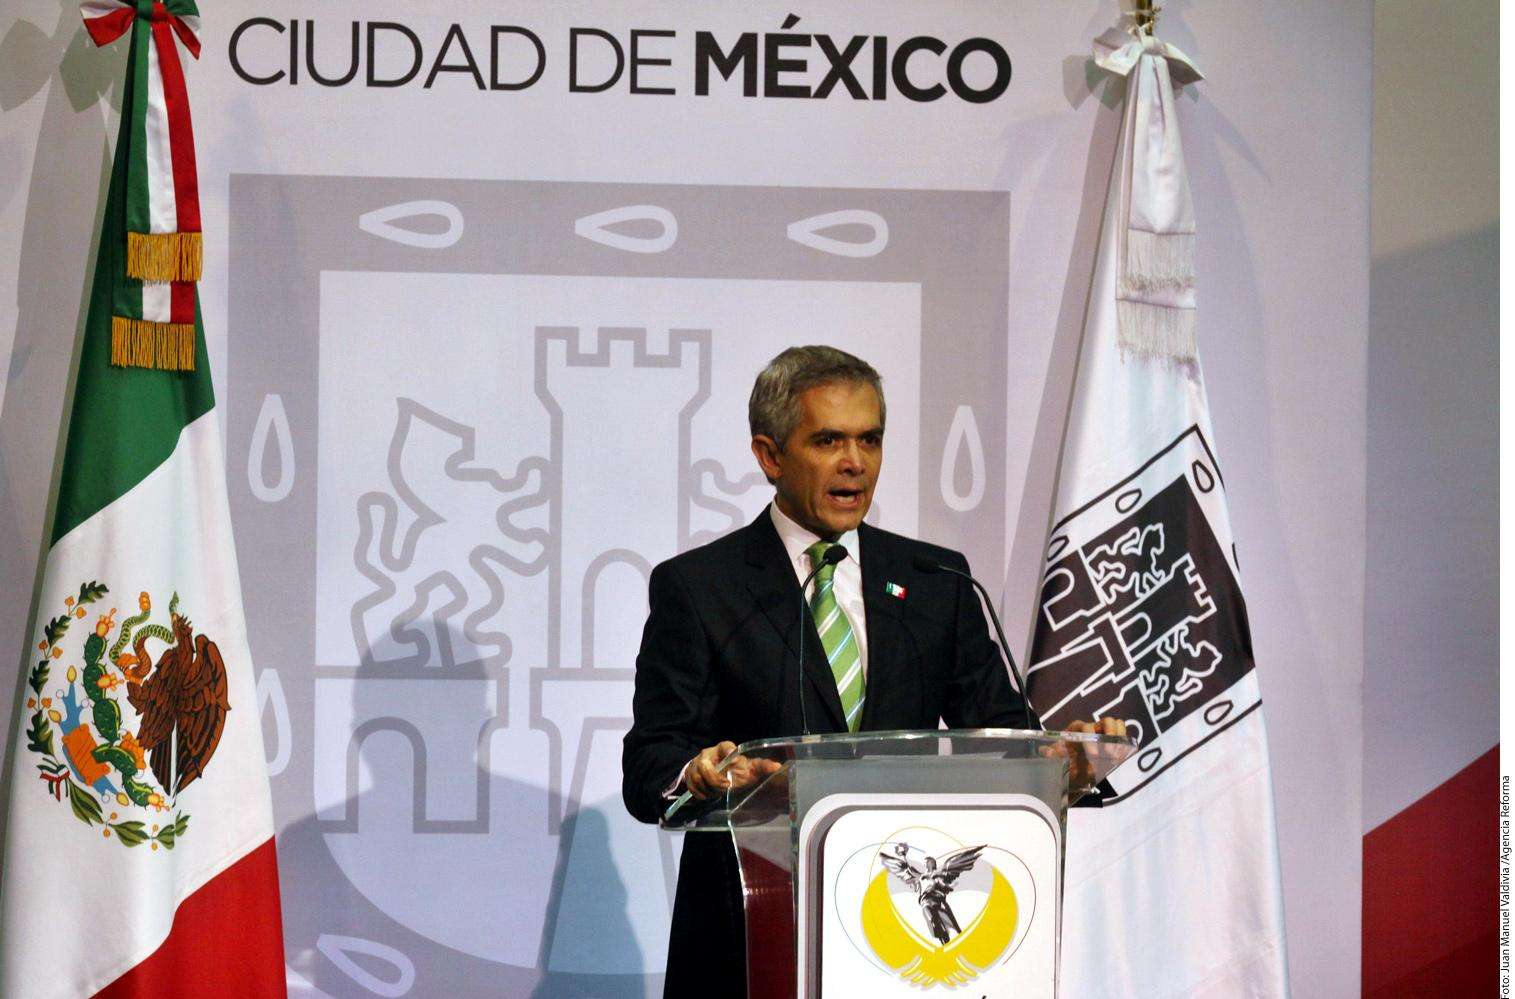 Miguel Ángel Mancera Foto: Agencia Reforma